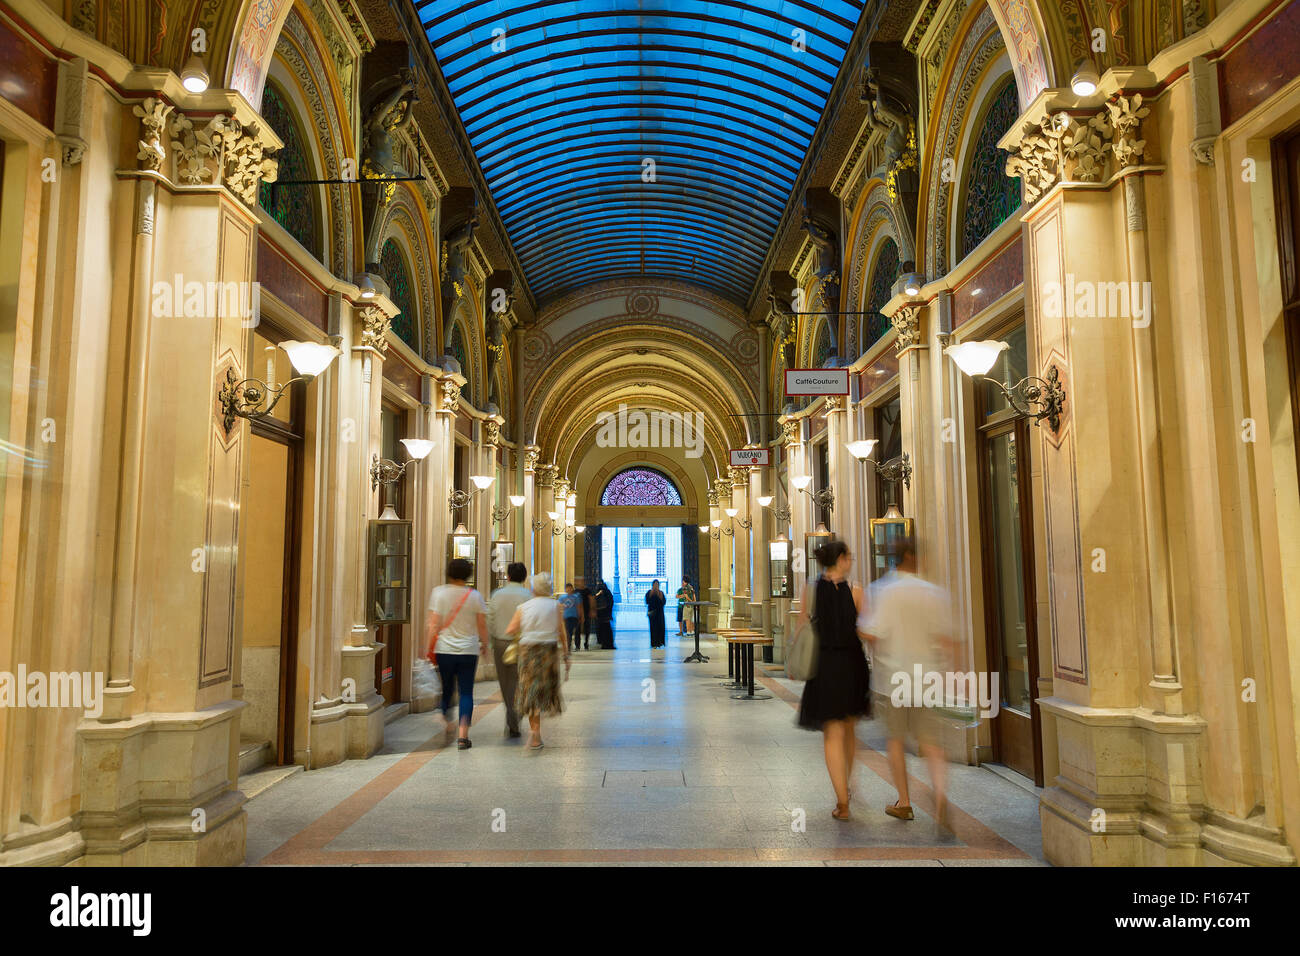 Vienna, Palais Vienna, Palais Ferstel arcade arcade - Stock Image